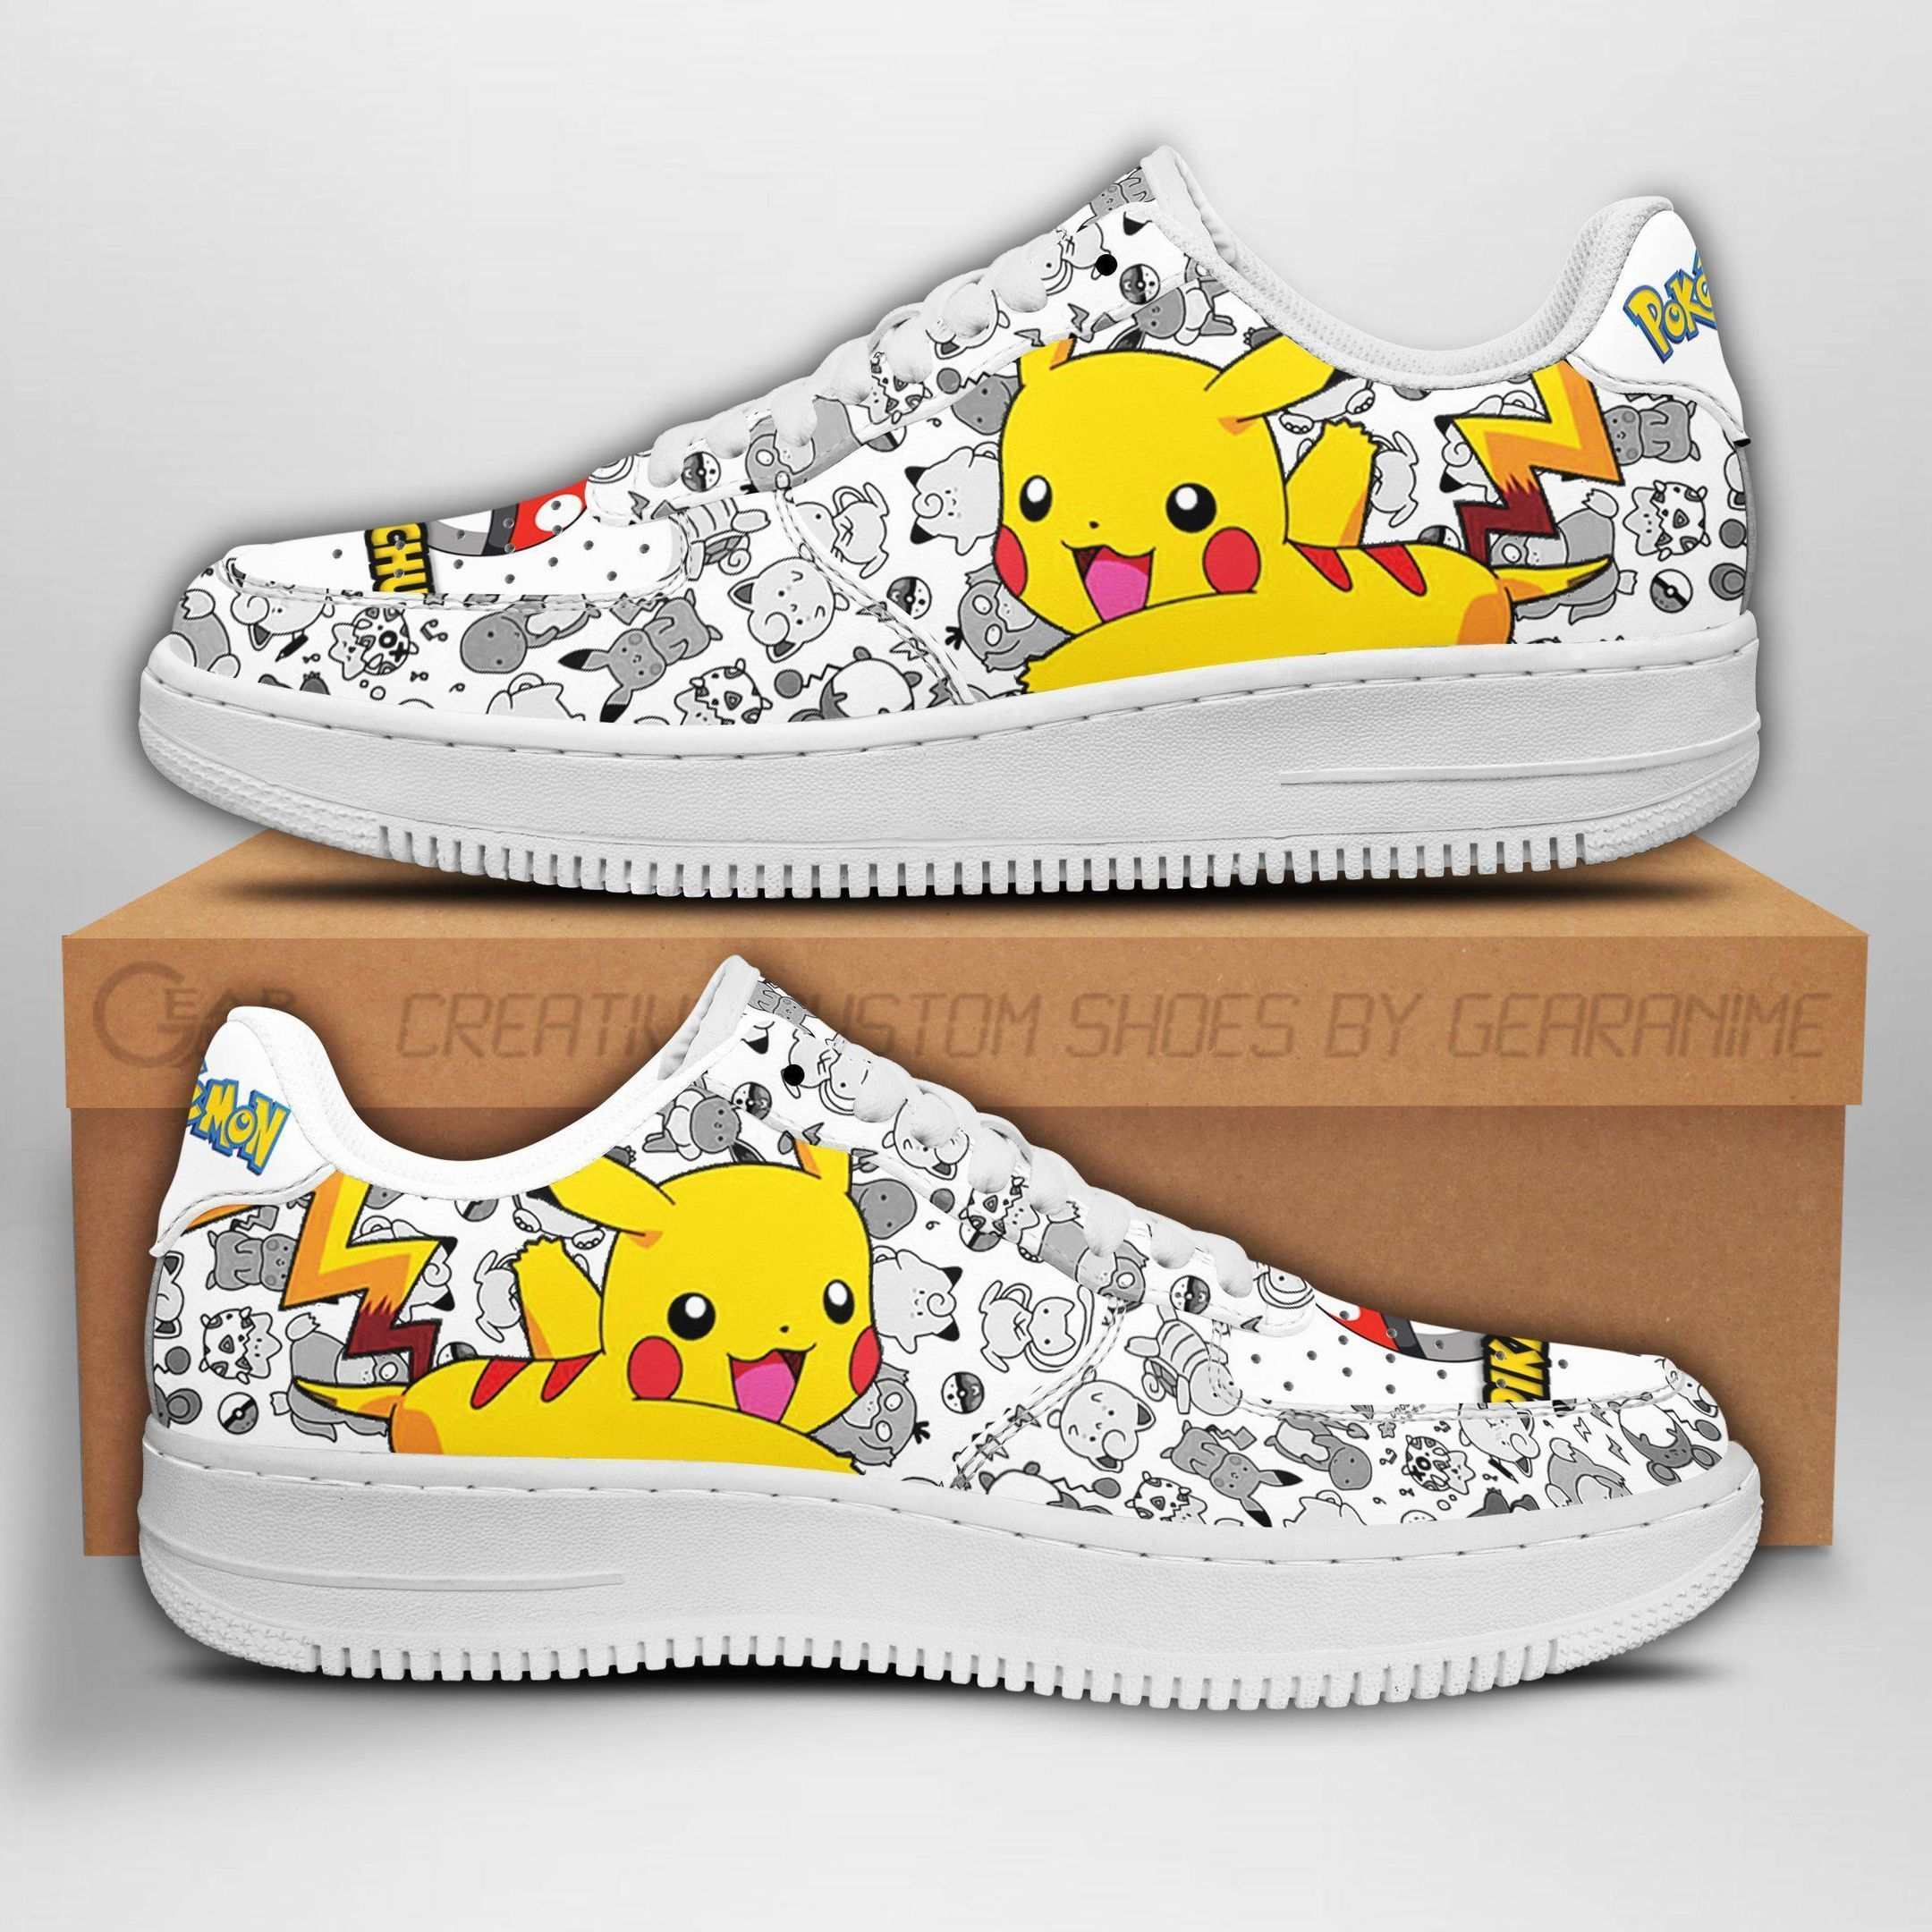 Pikachu Air Shoes Pokemon Shoes Fan Gift Idea GO1012